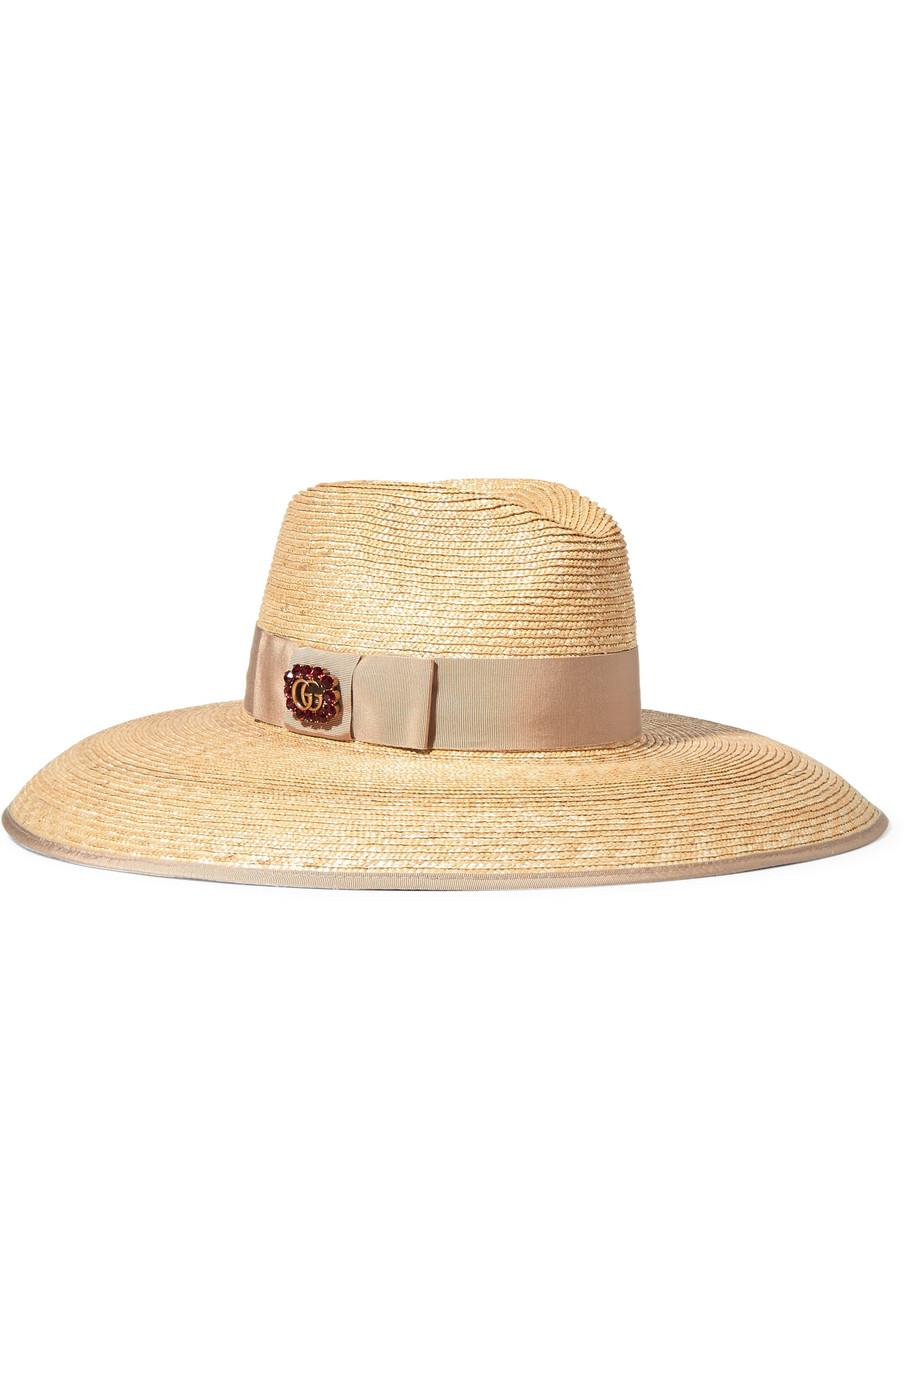 Embellished Grosgrain-trimmed Straw Hat - Beige Gucci QCY9vWW3